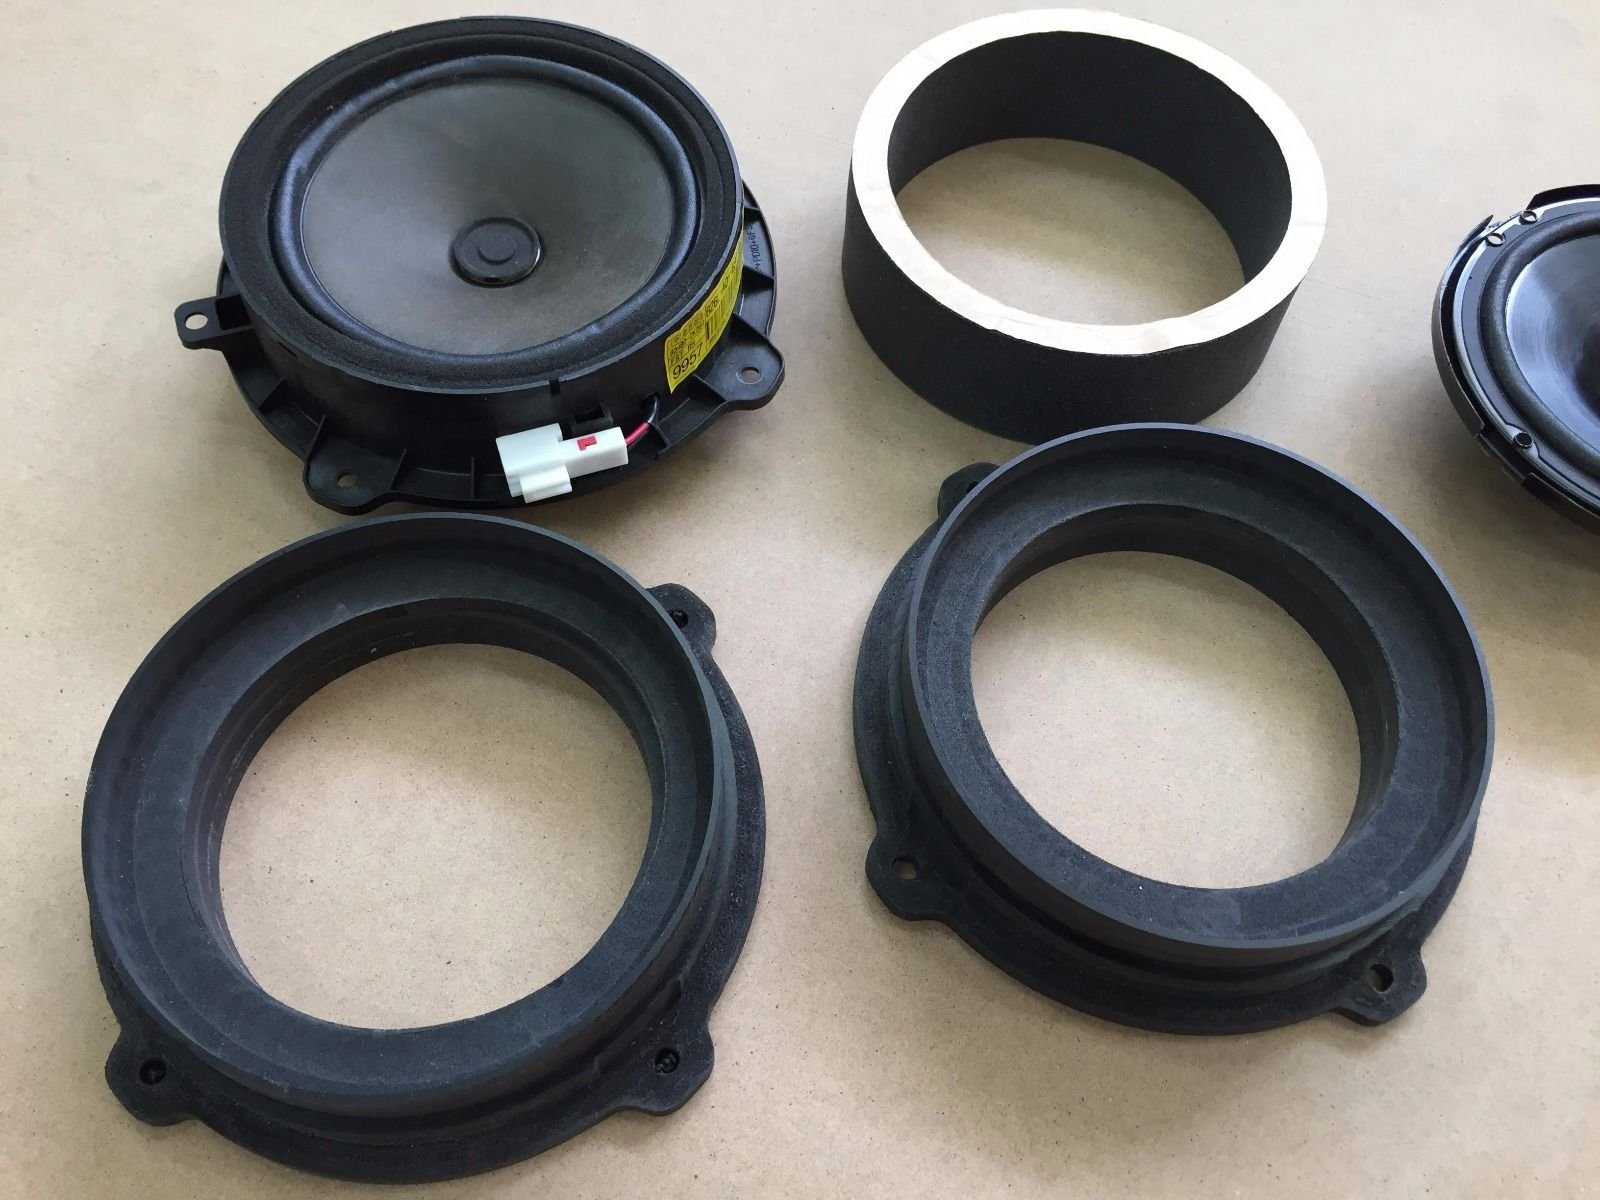 Hyundai Kia Speaker Adapters Aftermarket Speaker Install